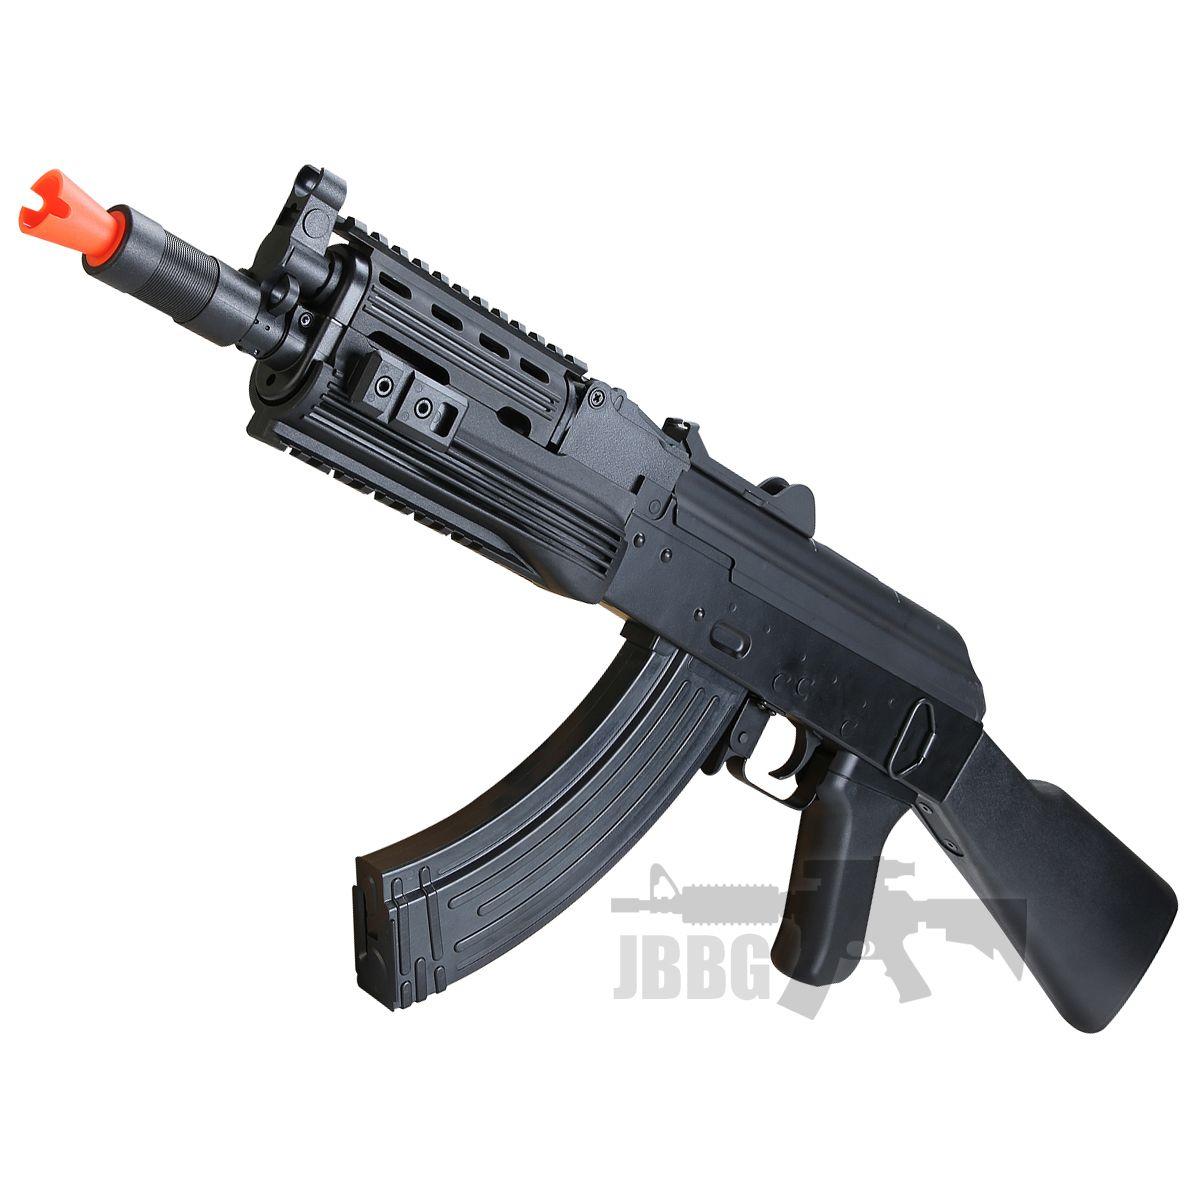 BULLDOG Semi/Fully Automatic AK-47 SR47C Airsoft AEG Rifle